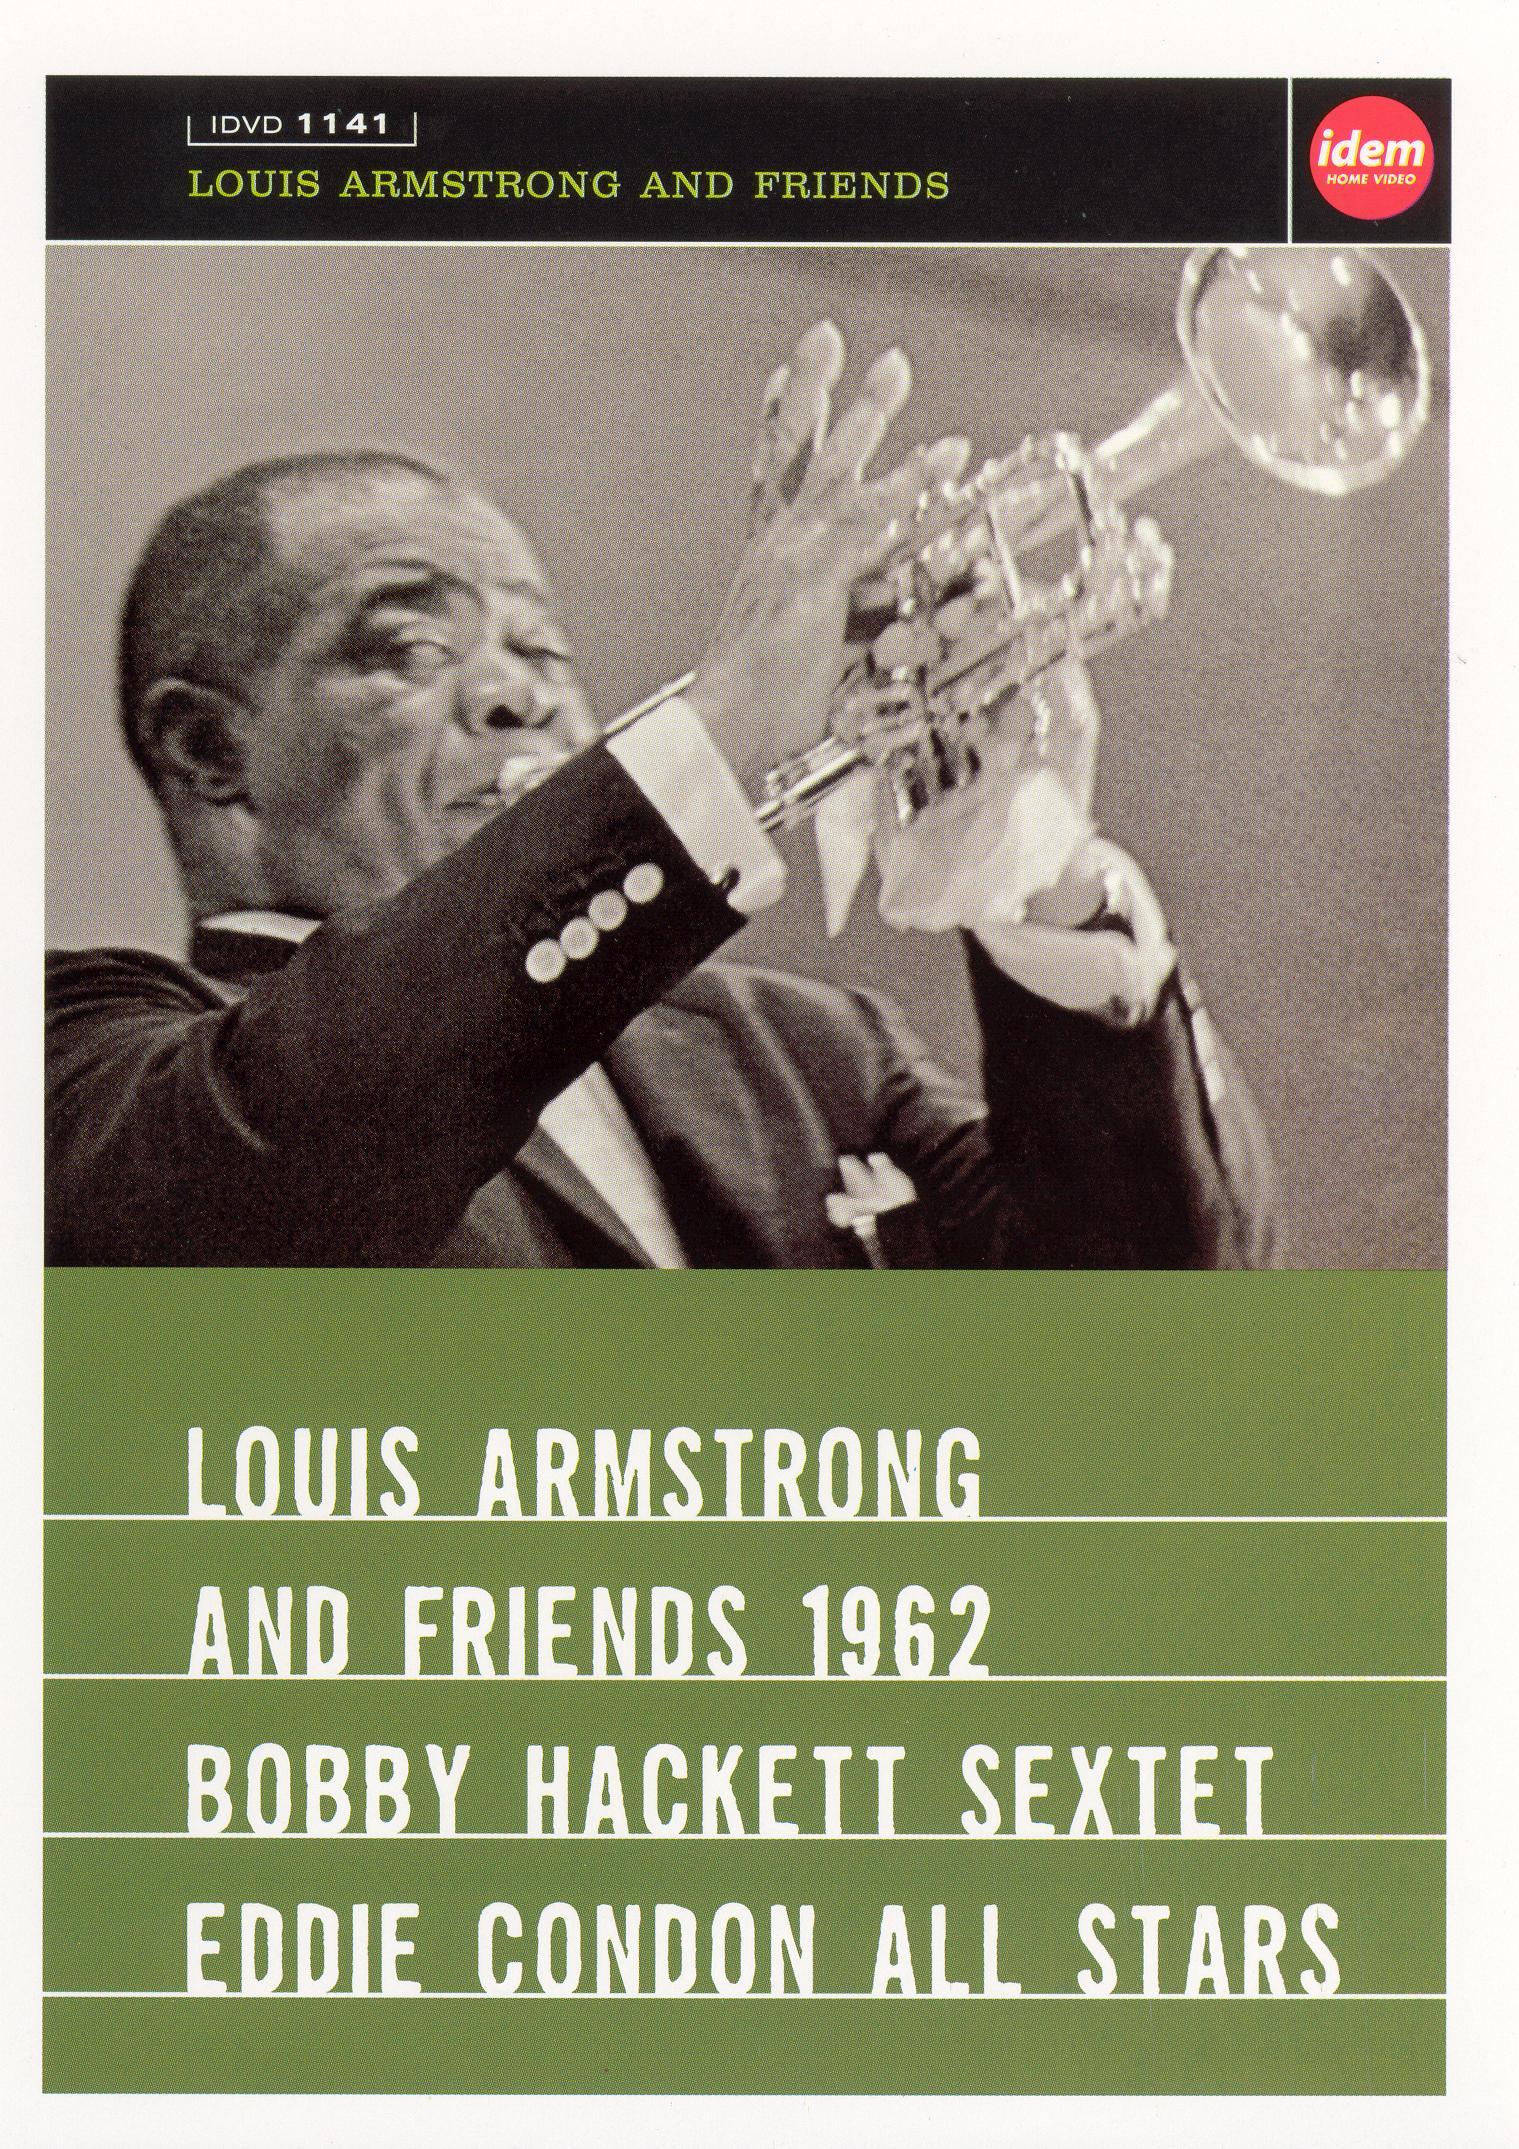 Louis Armstrong & Friends 1962: Bobby Hackett/Eddie Condon